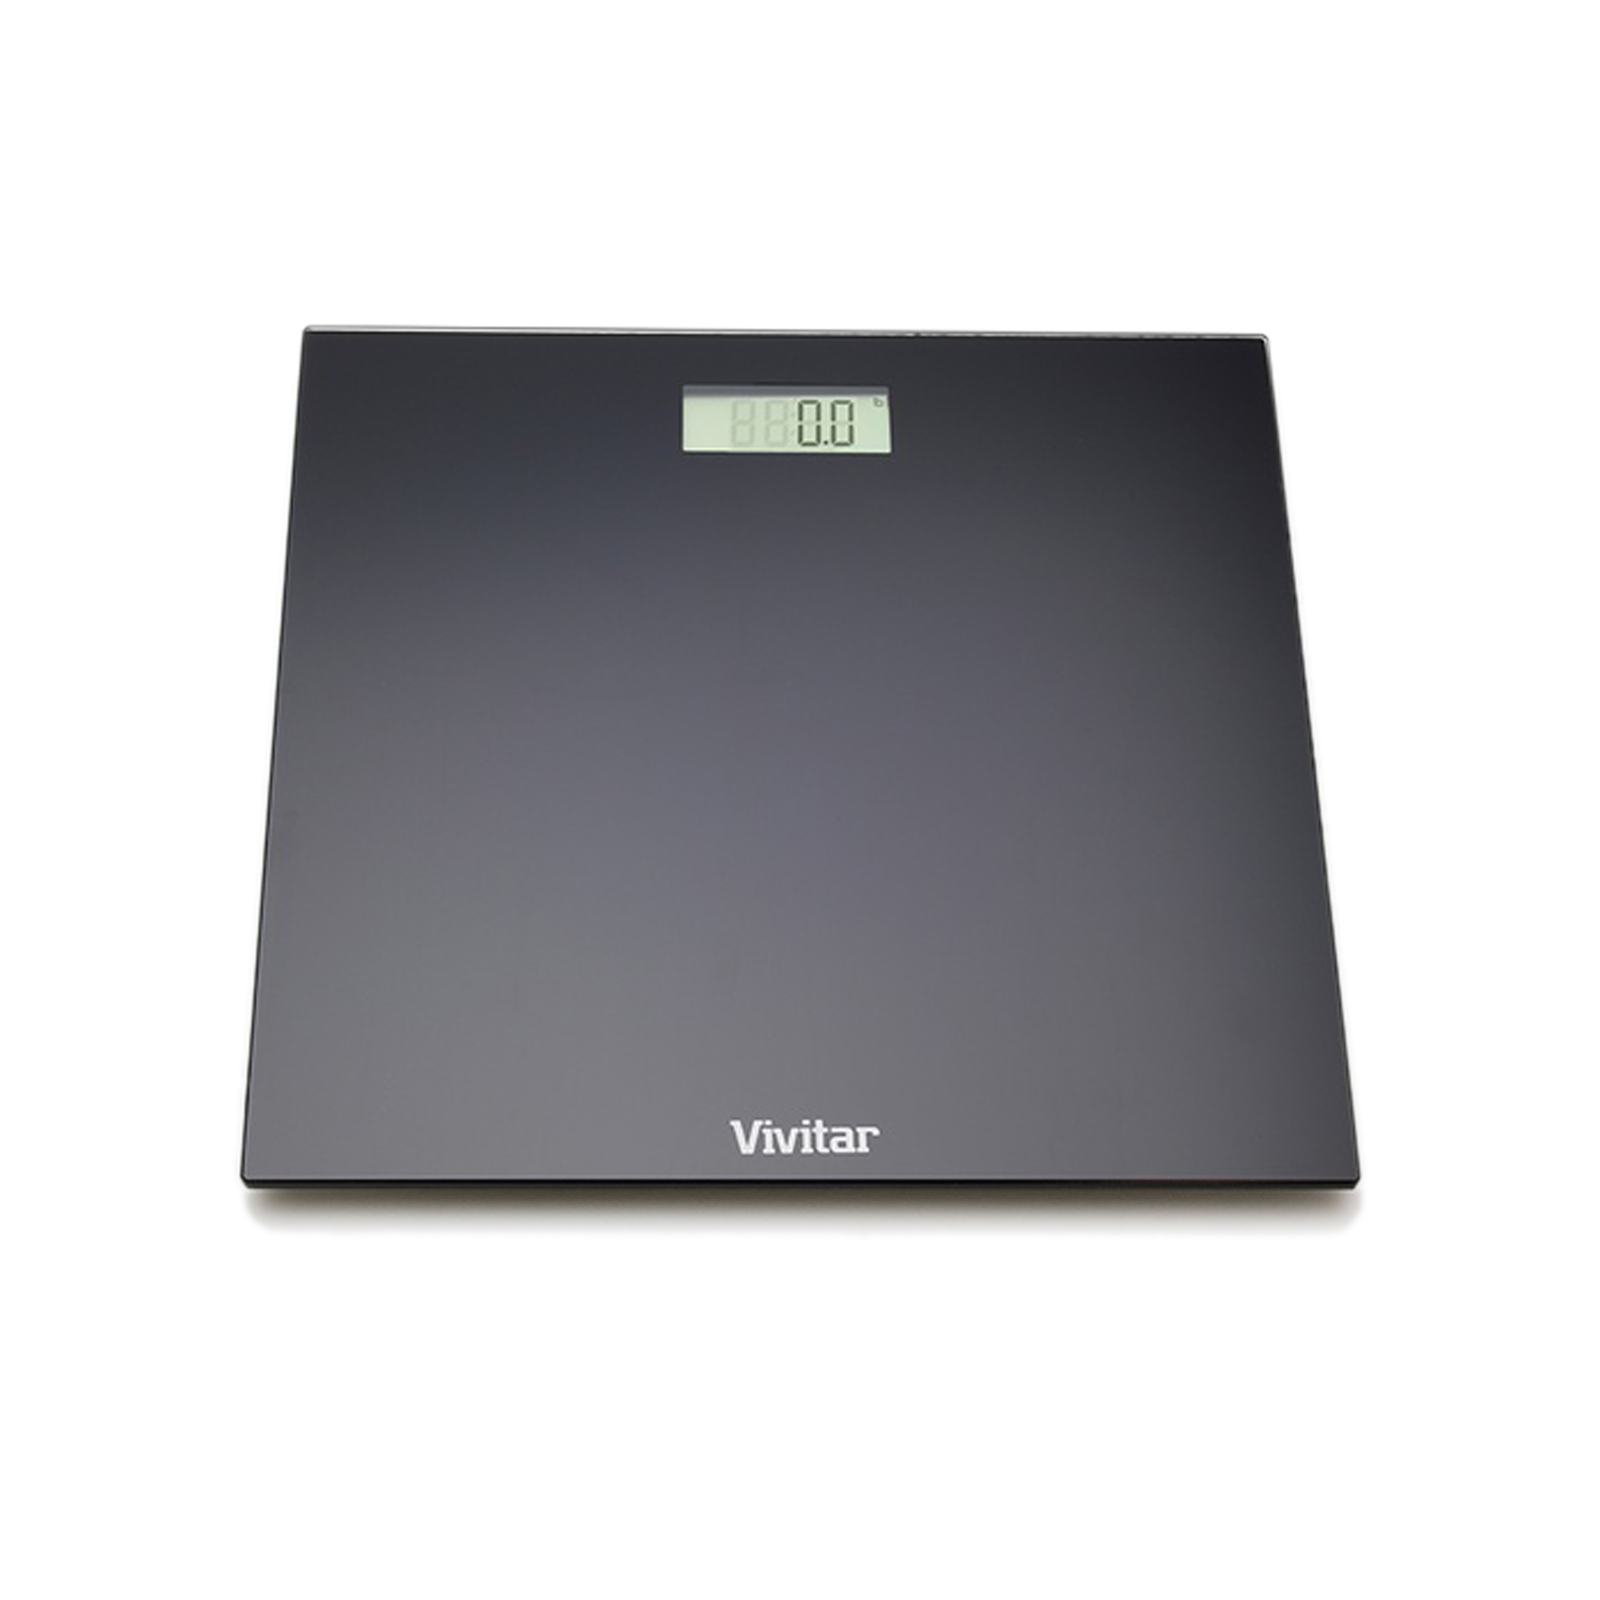 vivitar bodypro digital bathroom scale-black - walmart